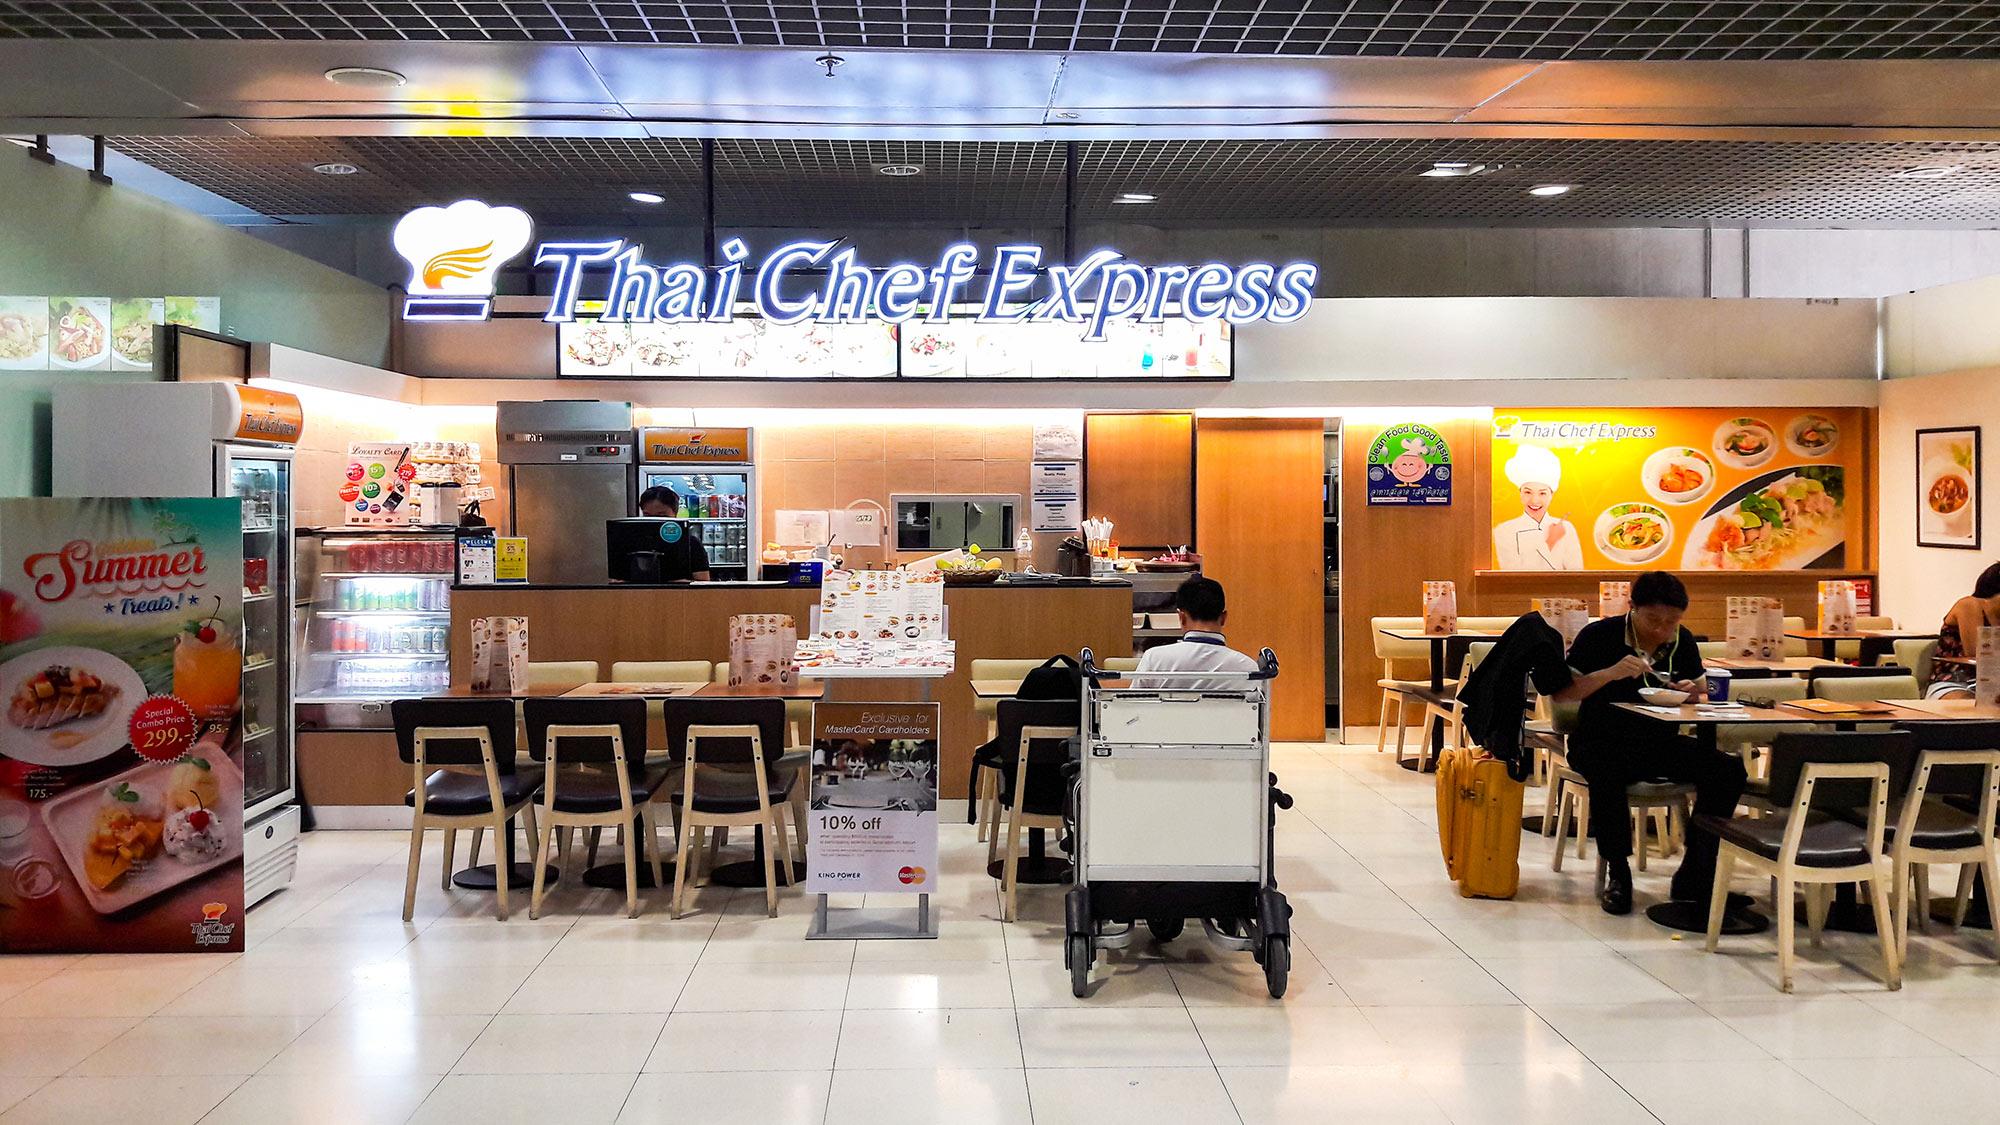 Thai Chef Express ไทยเชฟเอ็กเพรส  Thai Chef Express ท่าอากาศยานสุวรรณภูมิ 20160310 153104